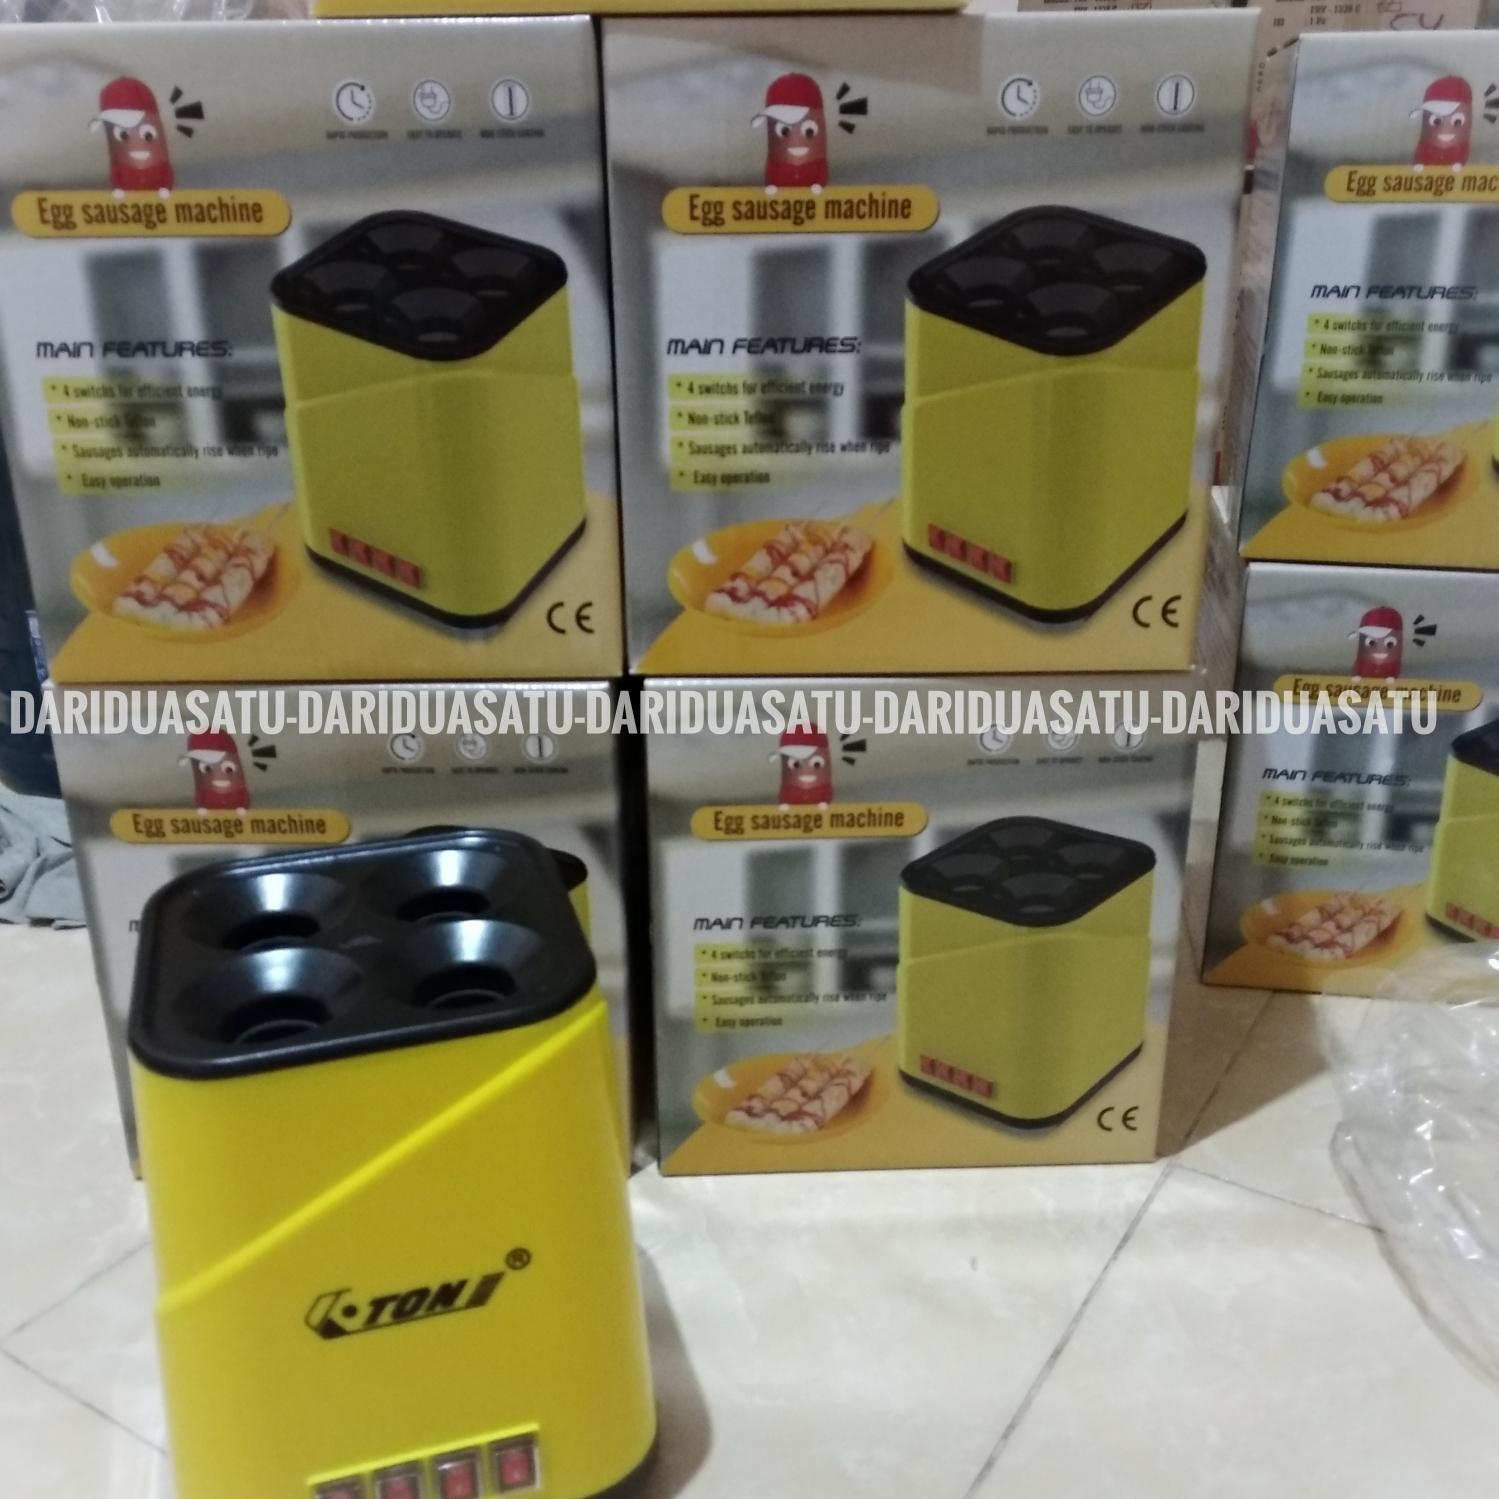 Buy Sell Cheapest Sostel Ready Mesin Best Quality Product Deals Alat Sosis Telur 4 Lubang Lobang Egg Roll Pembuat